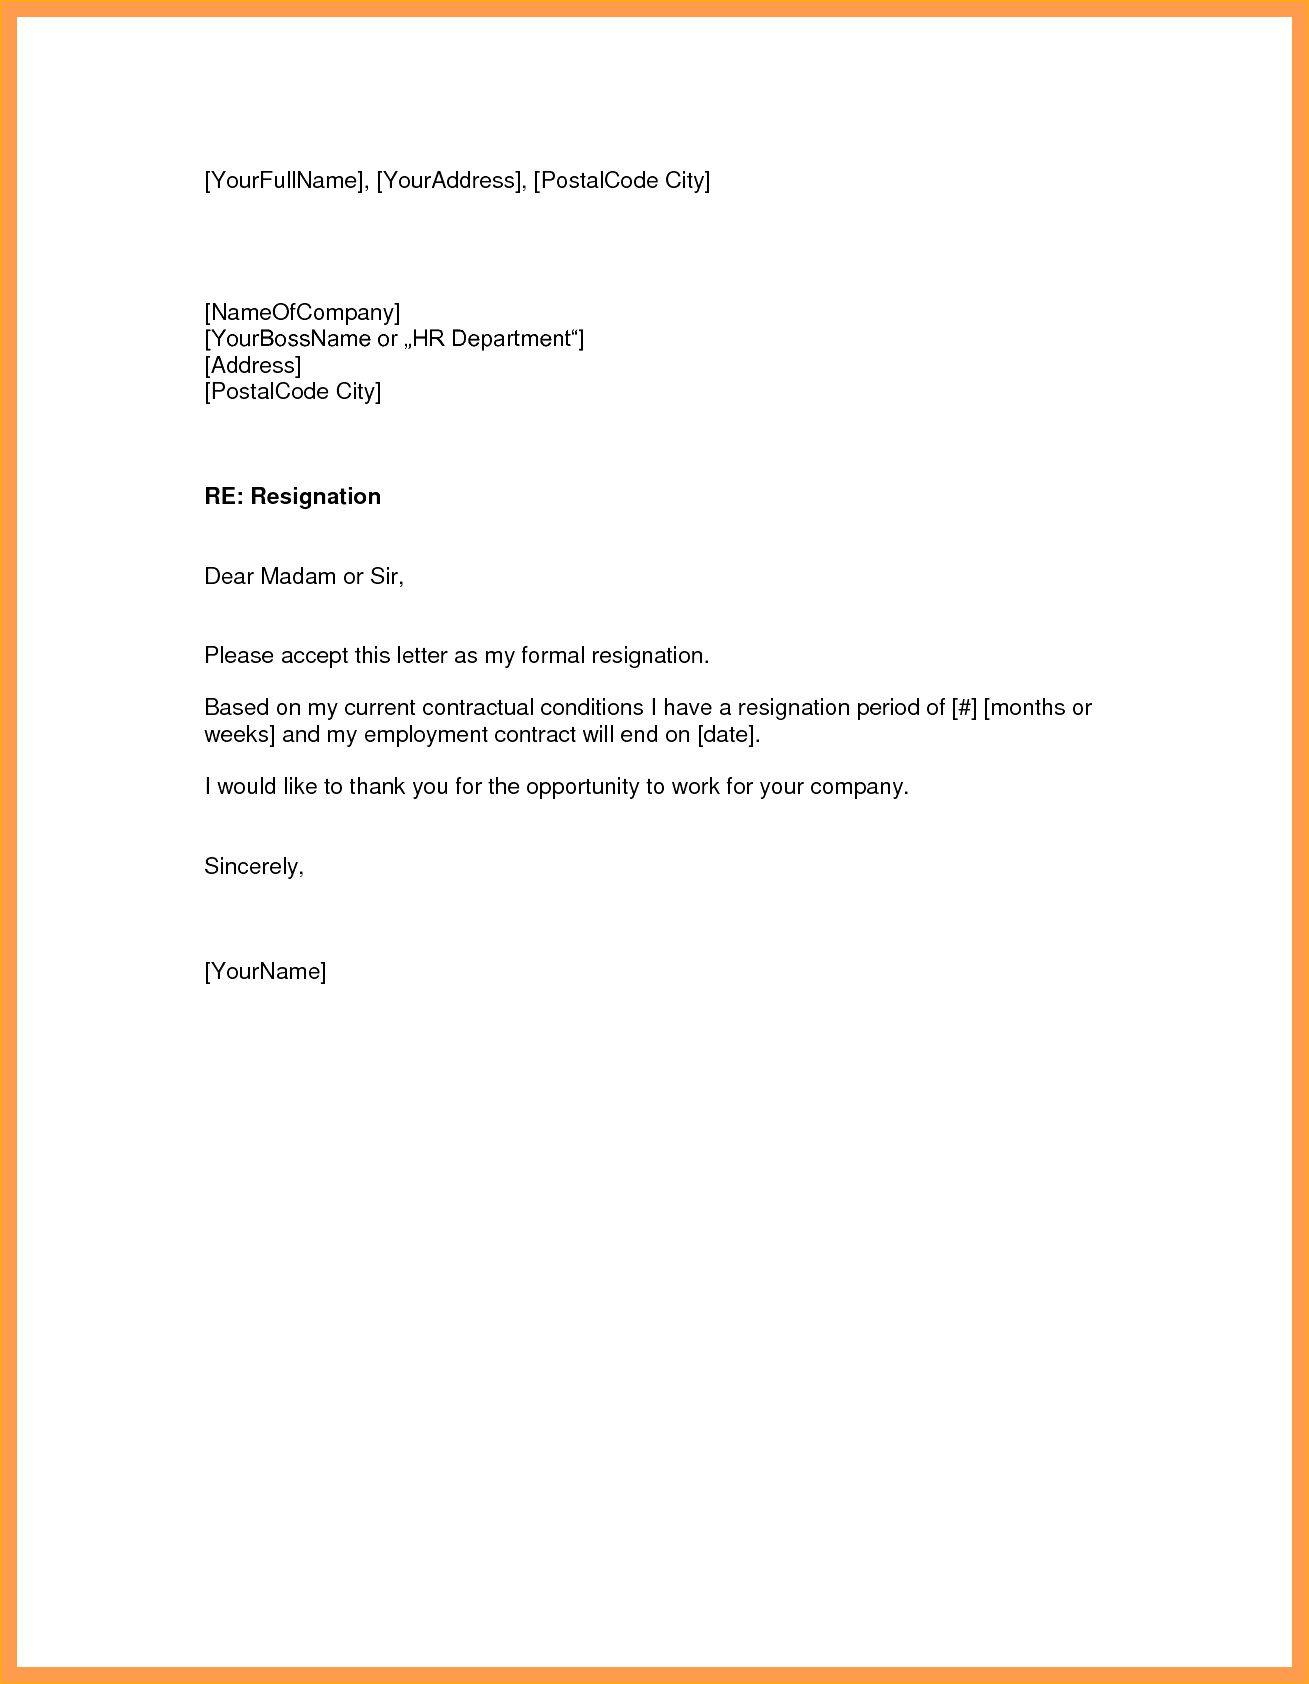 New Simple Resignation Letter Sample Download Http Letterbuis Com New Simple Resignation Letter Samp Resignation Letter Sample Resignation Letter Resignation